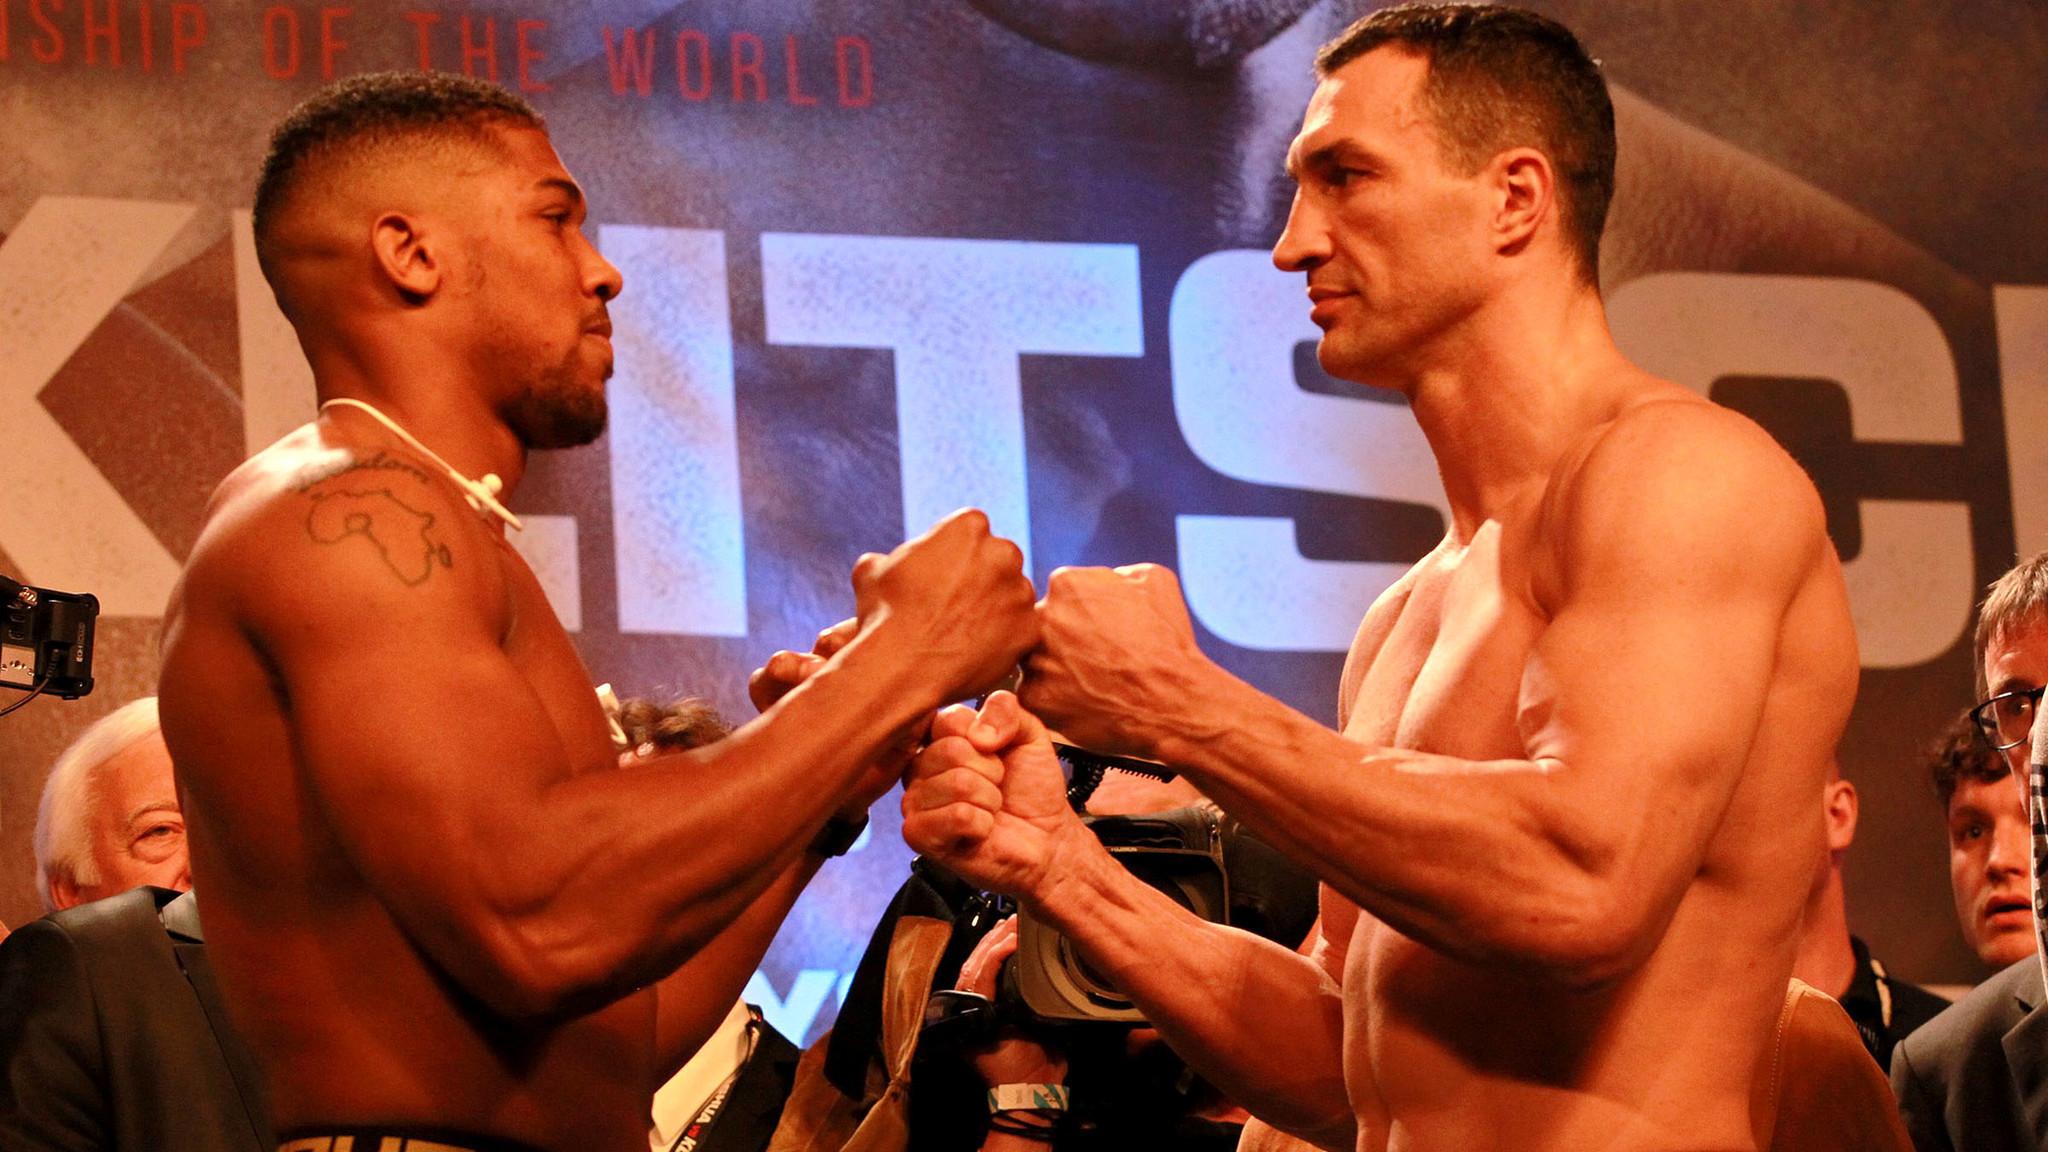 Live updates from Anthony Joshua vs. Wladimir Klitschko: Joshua wins it in the 11th with TKO